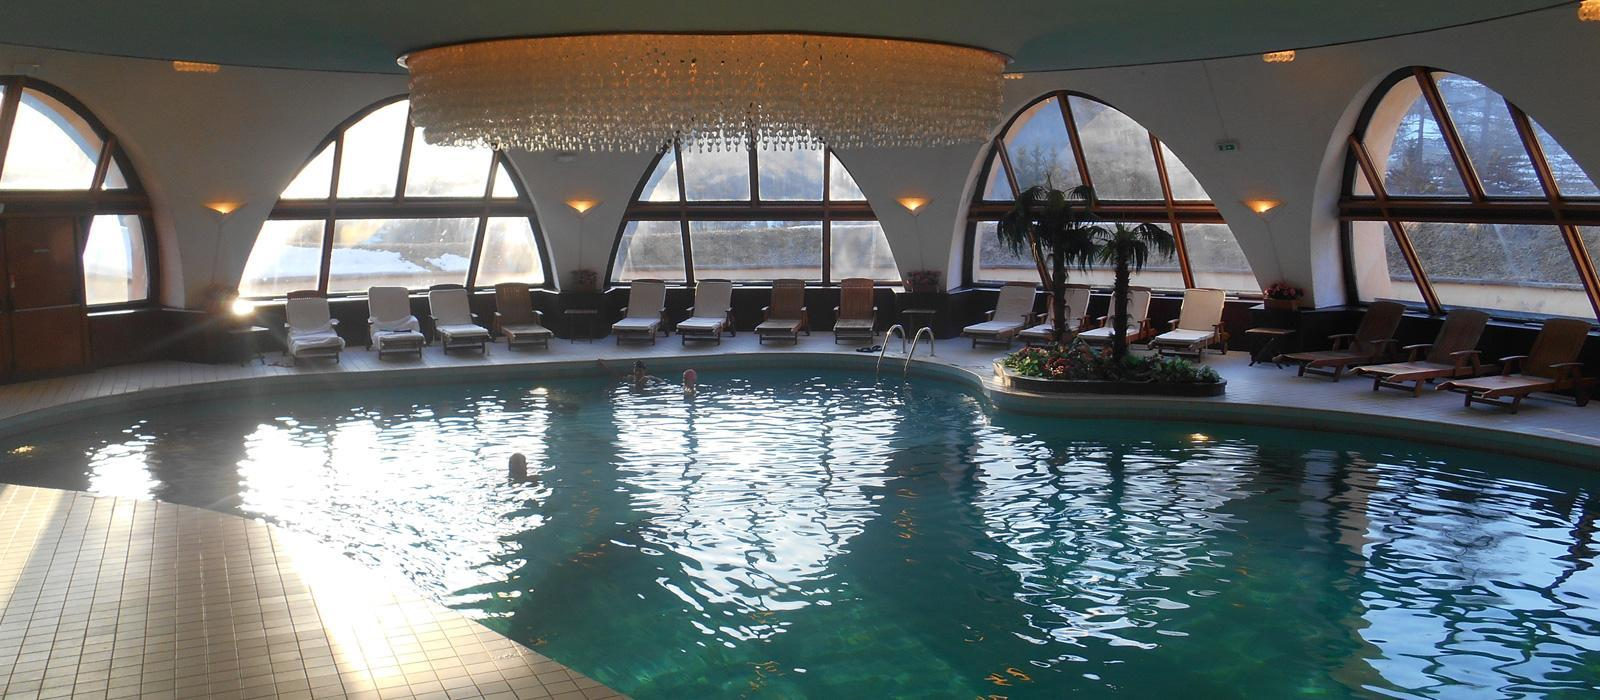 Hotel miramonti hotel 5 stelle cortina d 39 ampezzo - Hotel a cortina d ampezzo con piscina ...